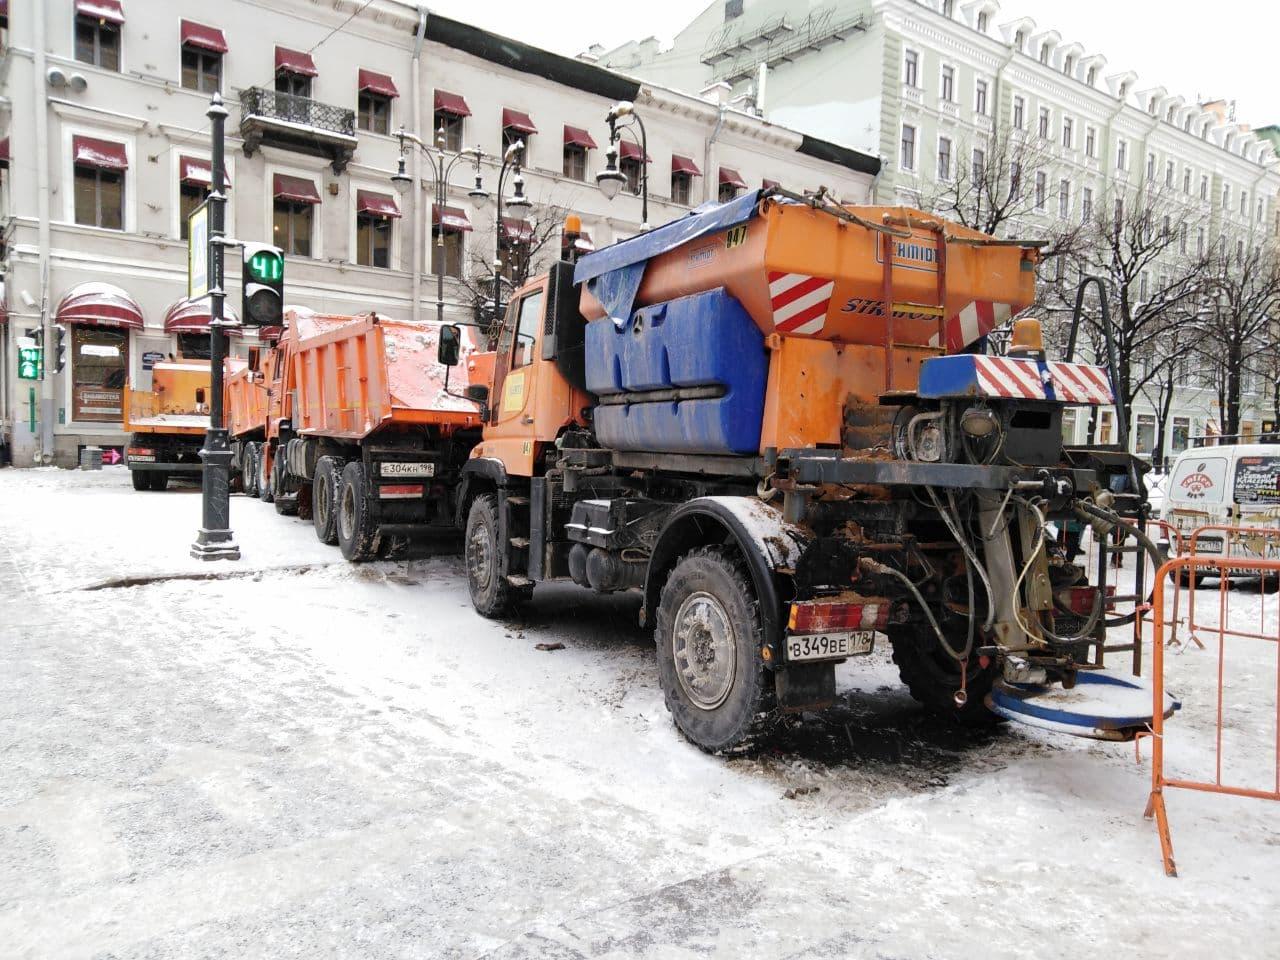 фото ЗакС политика Бороться с последствиями петербургского снегопада продолжают сотни единиц техники